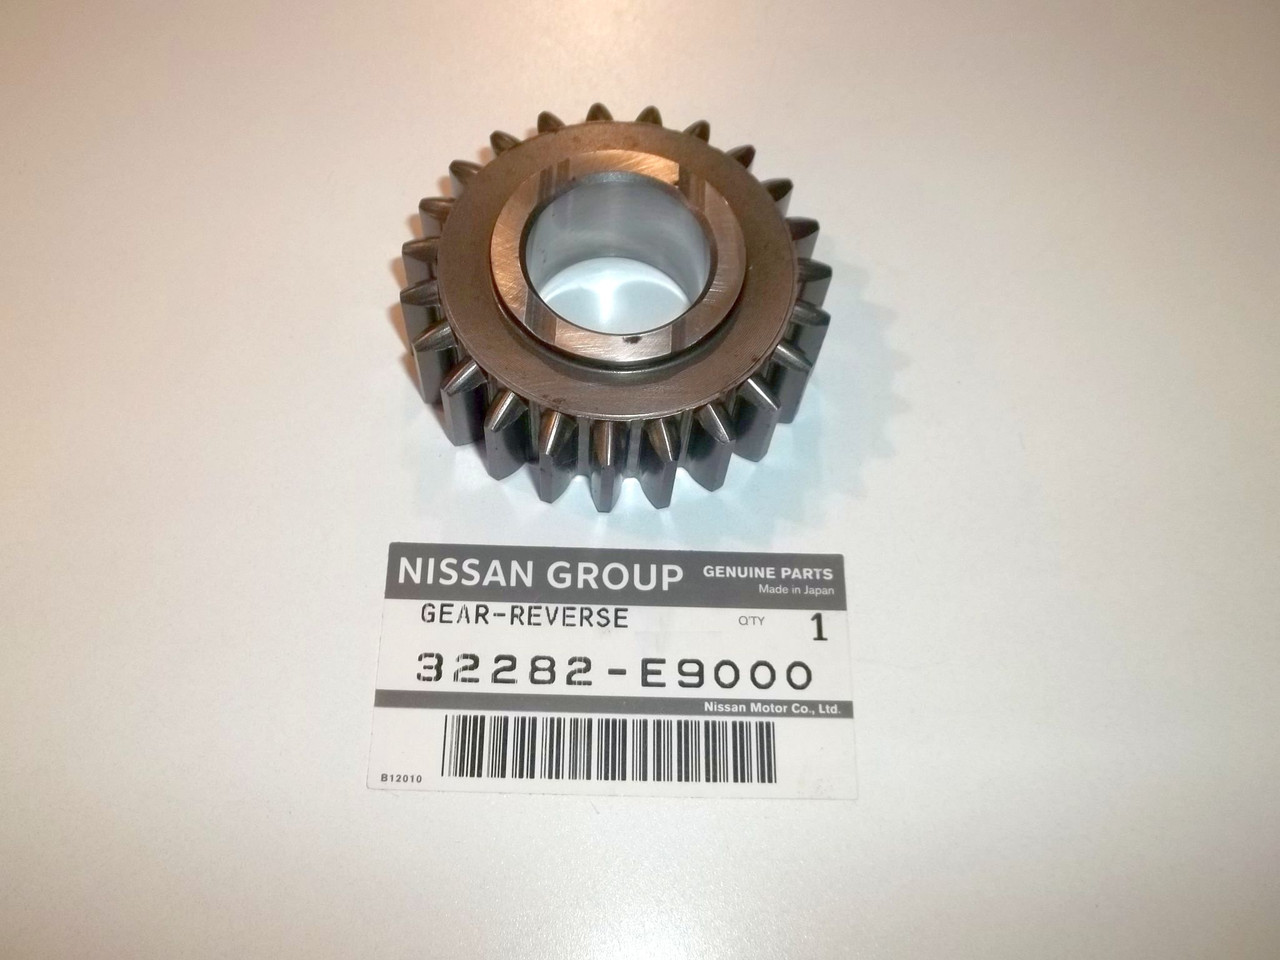 32282-E9000